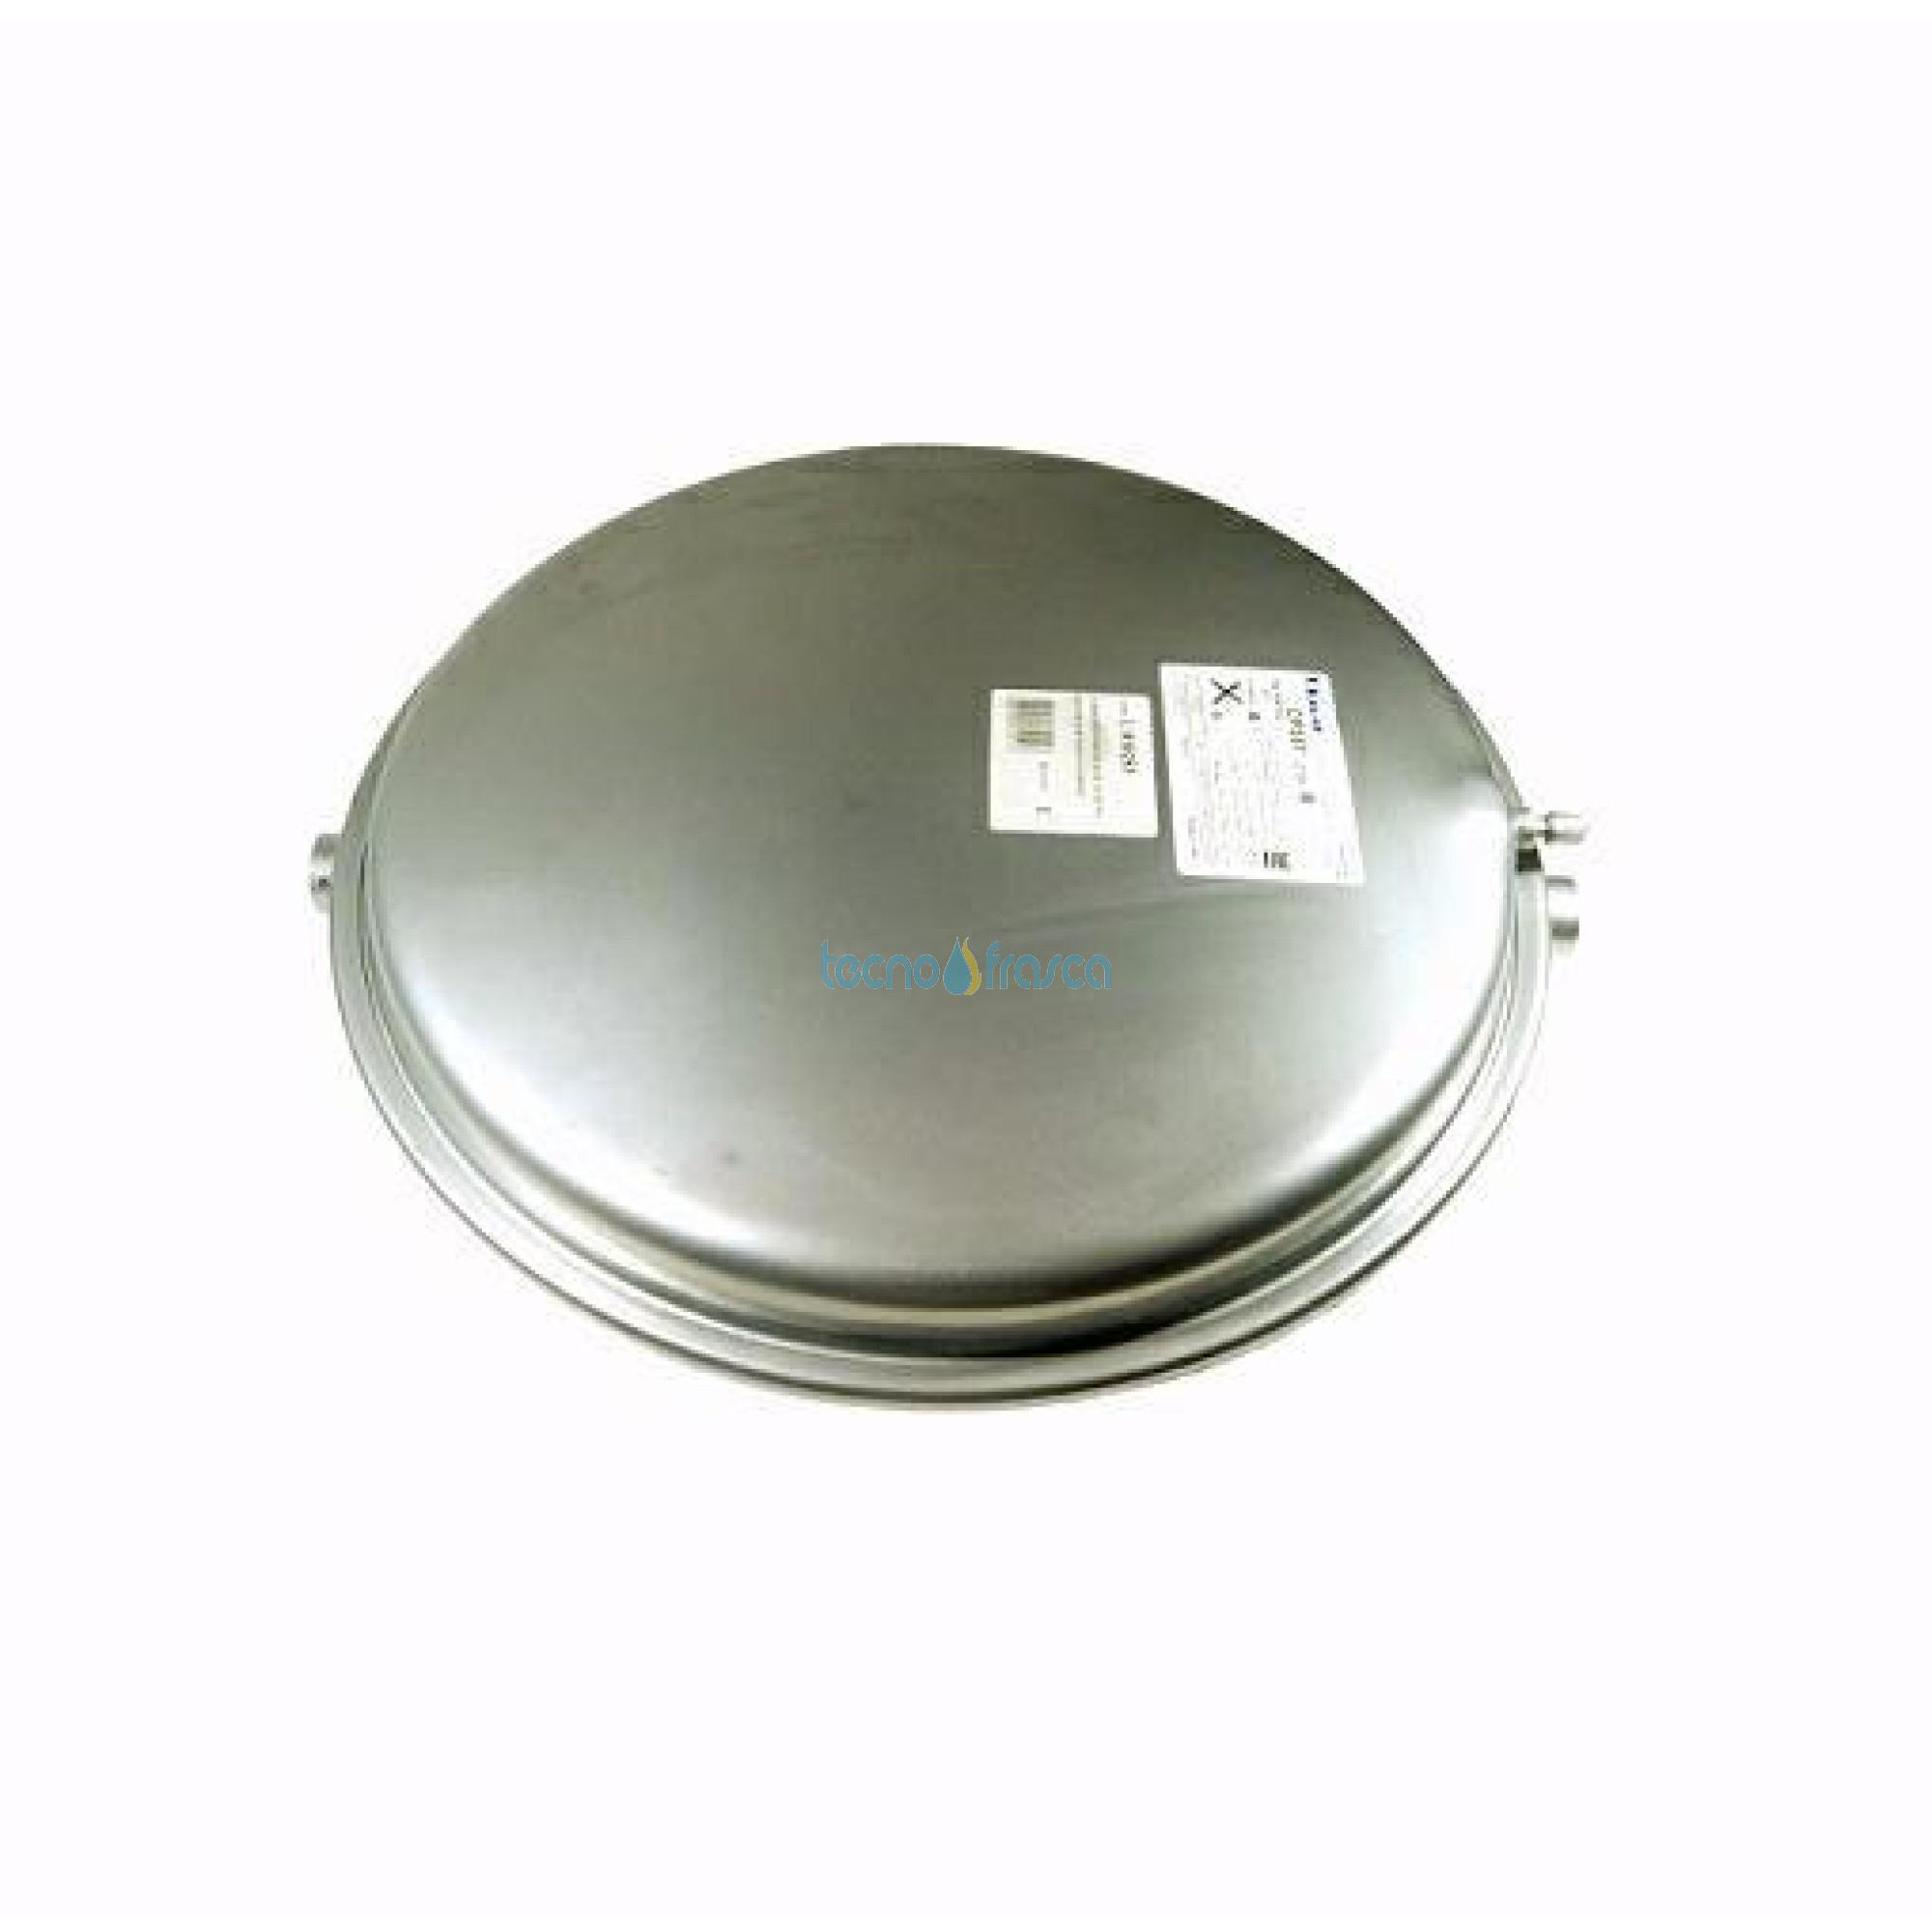 Immergas vaso di espansione lt8 nike-eolo-maior-superior 1.010253